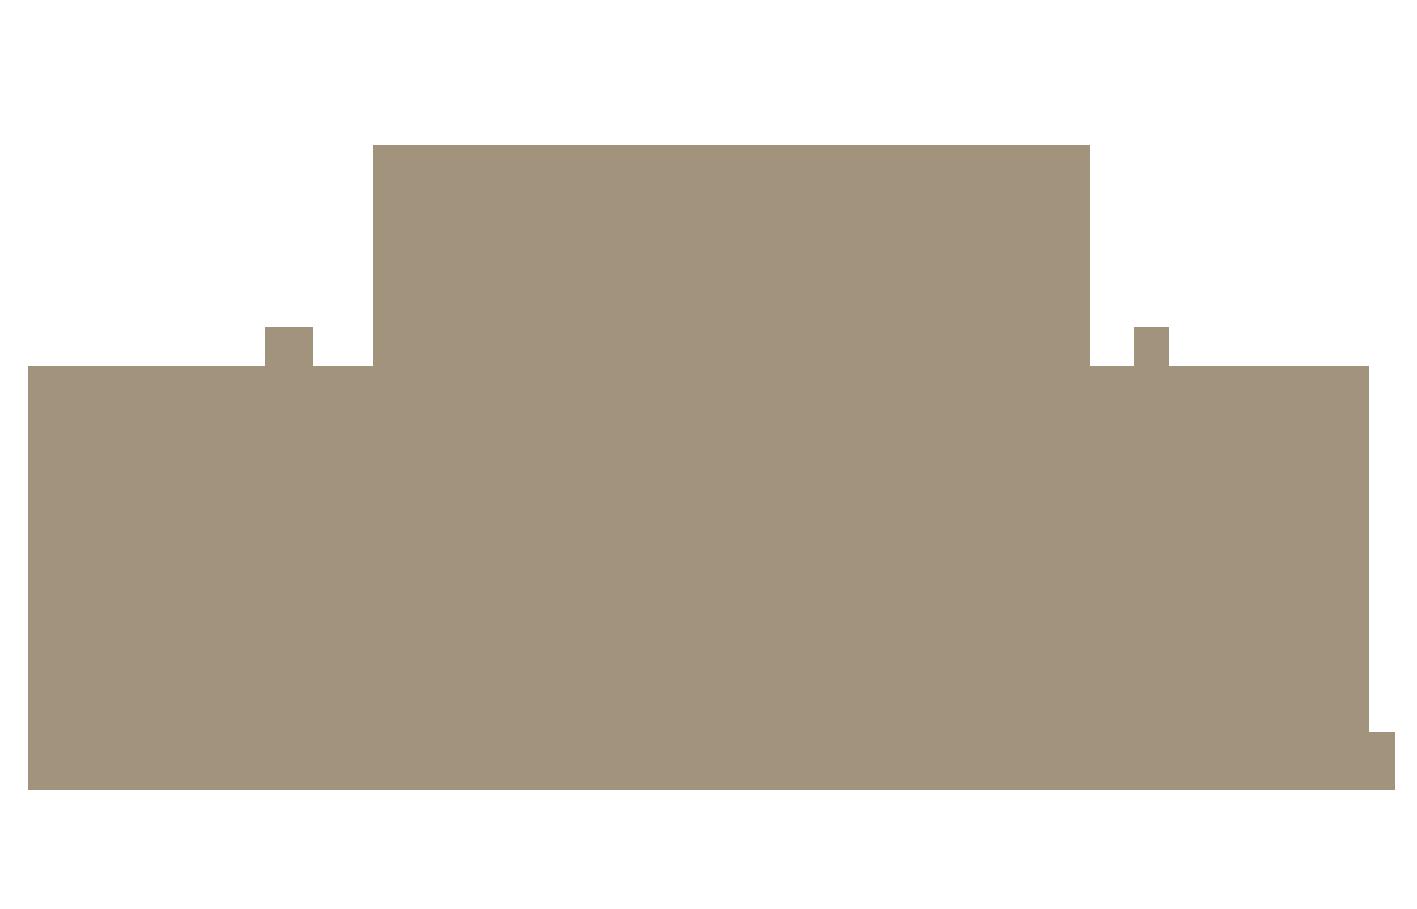 International Network For Traditional Building, Architecture & Urbanism (INTBAU) logo